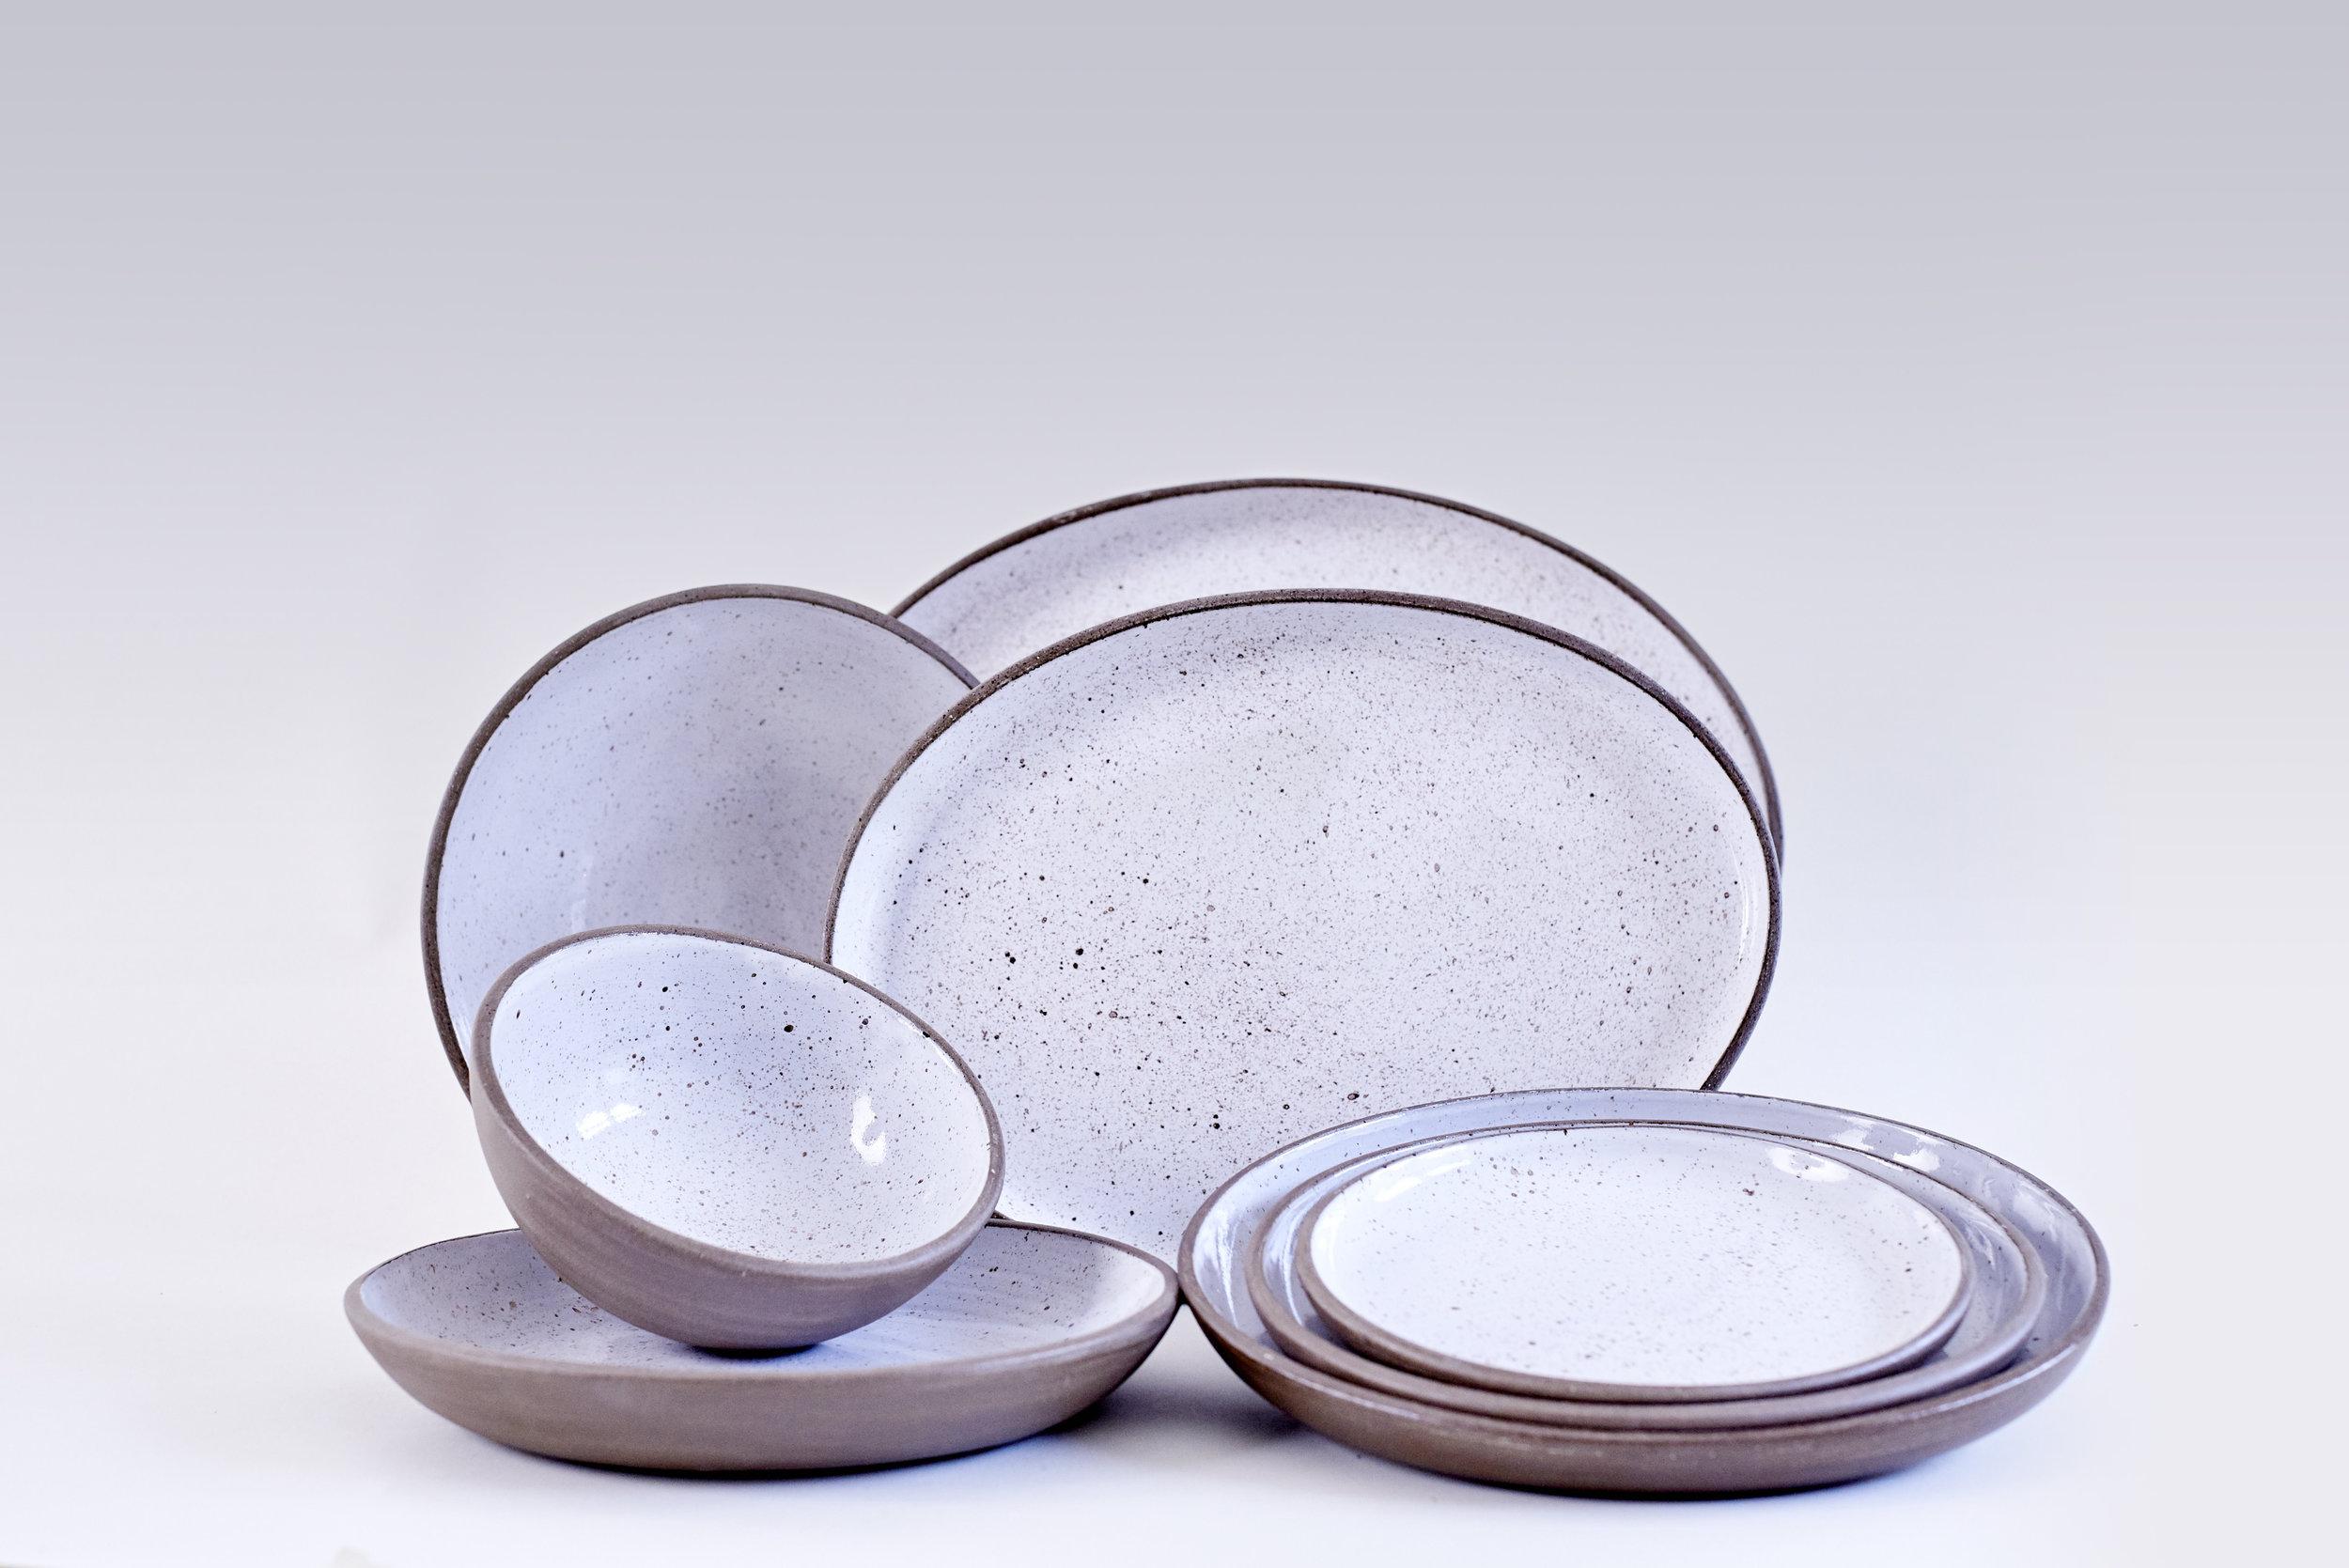 Goose Egg  Dessert Plate 18cm £27  Pasta Plate 23cm £31  Dinner Plate 25cm £35  Big Platter £70  Cereal Bowl 15cm £24  Deep Bowl 23cm £50